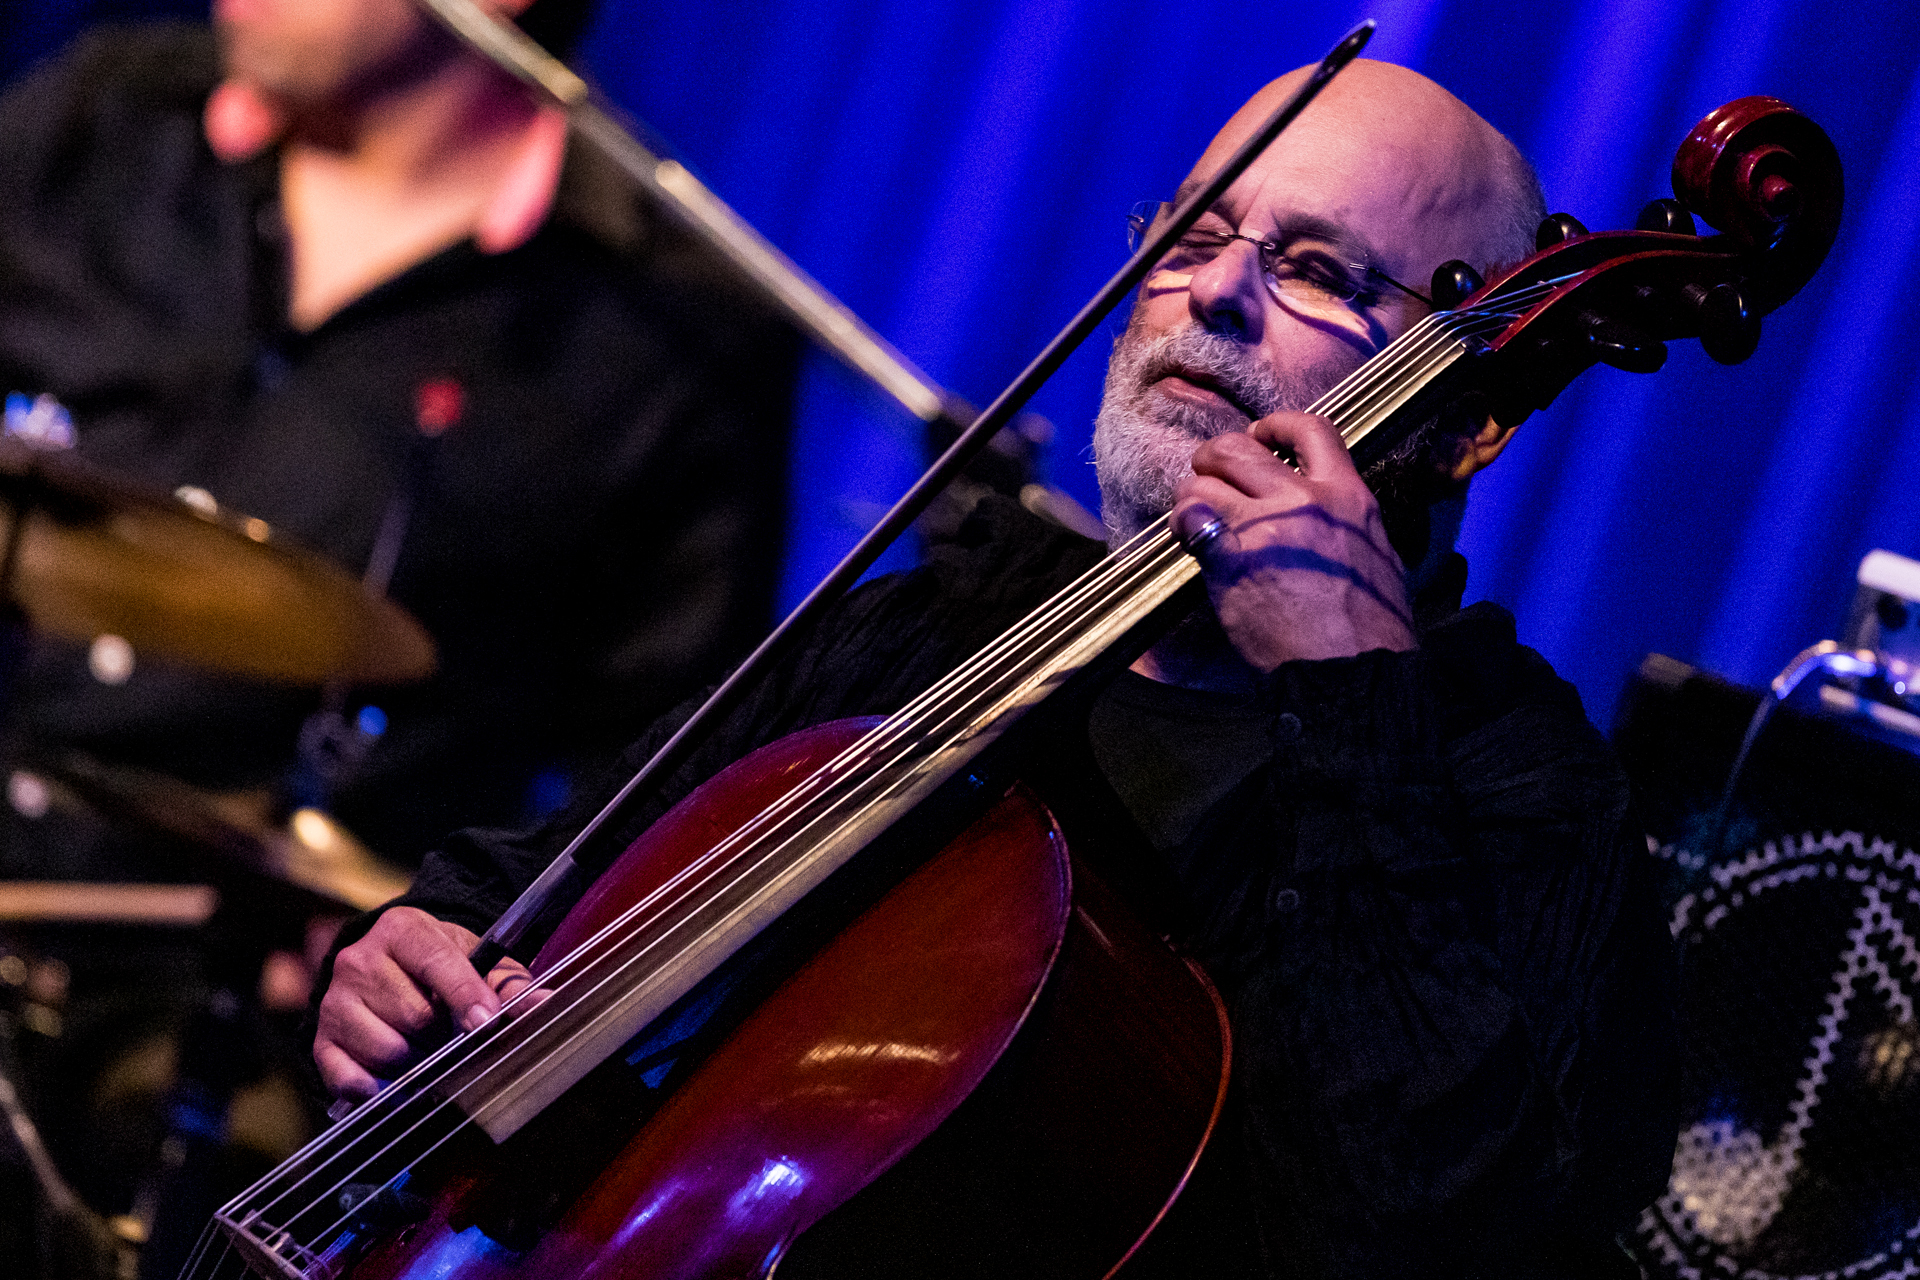 2019_09_05-Jaques-Morelenbaum-Cello-Samba-Trio-©-Luca-Vantusso-213608-5D4B5201